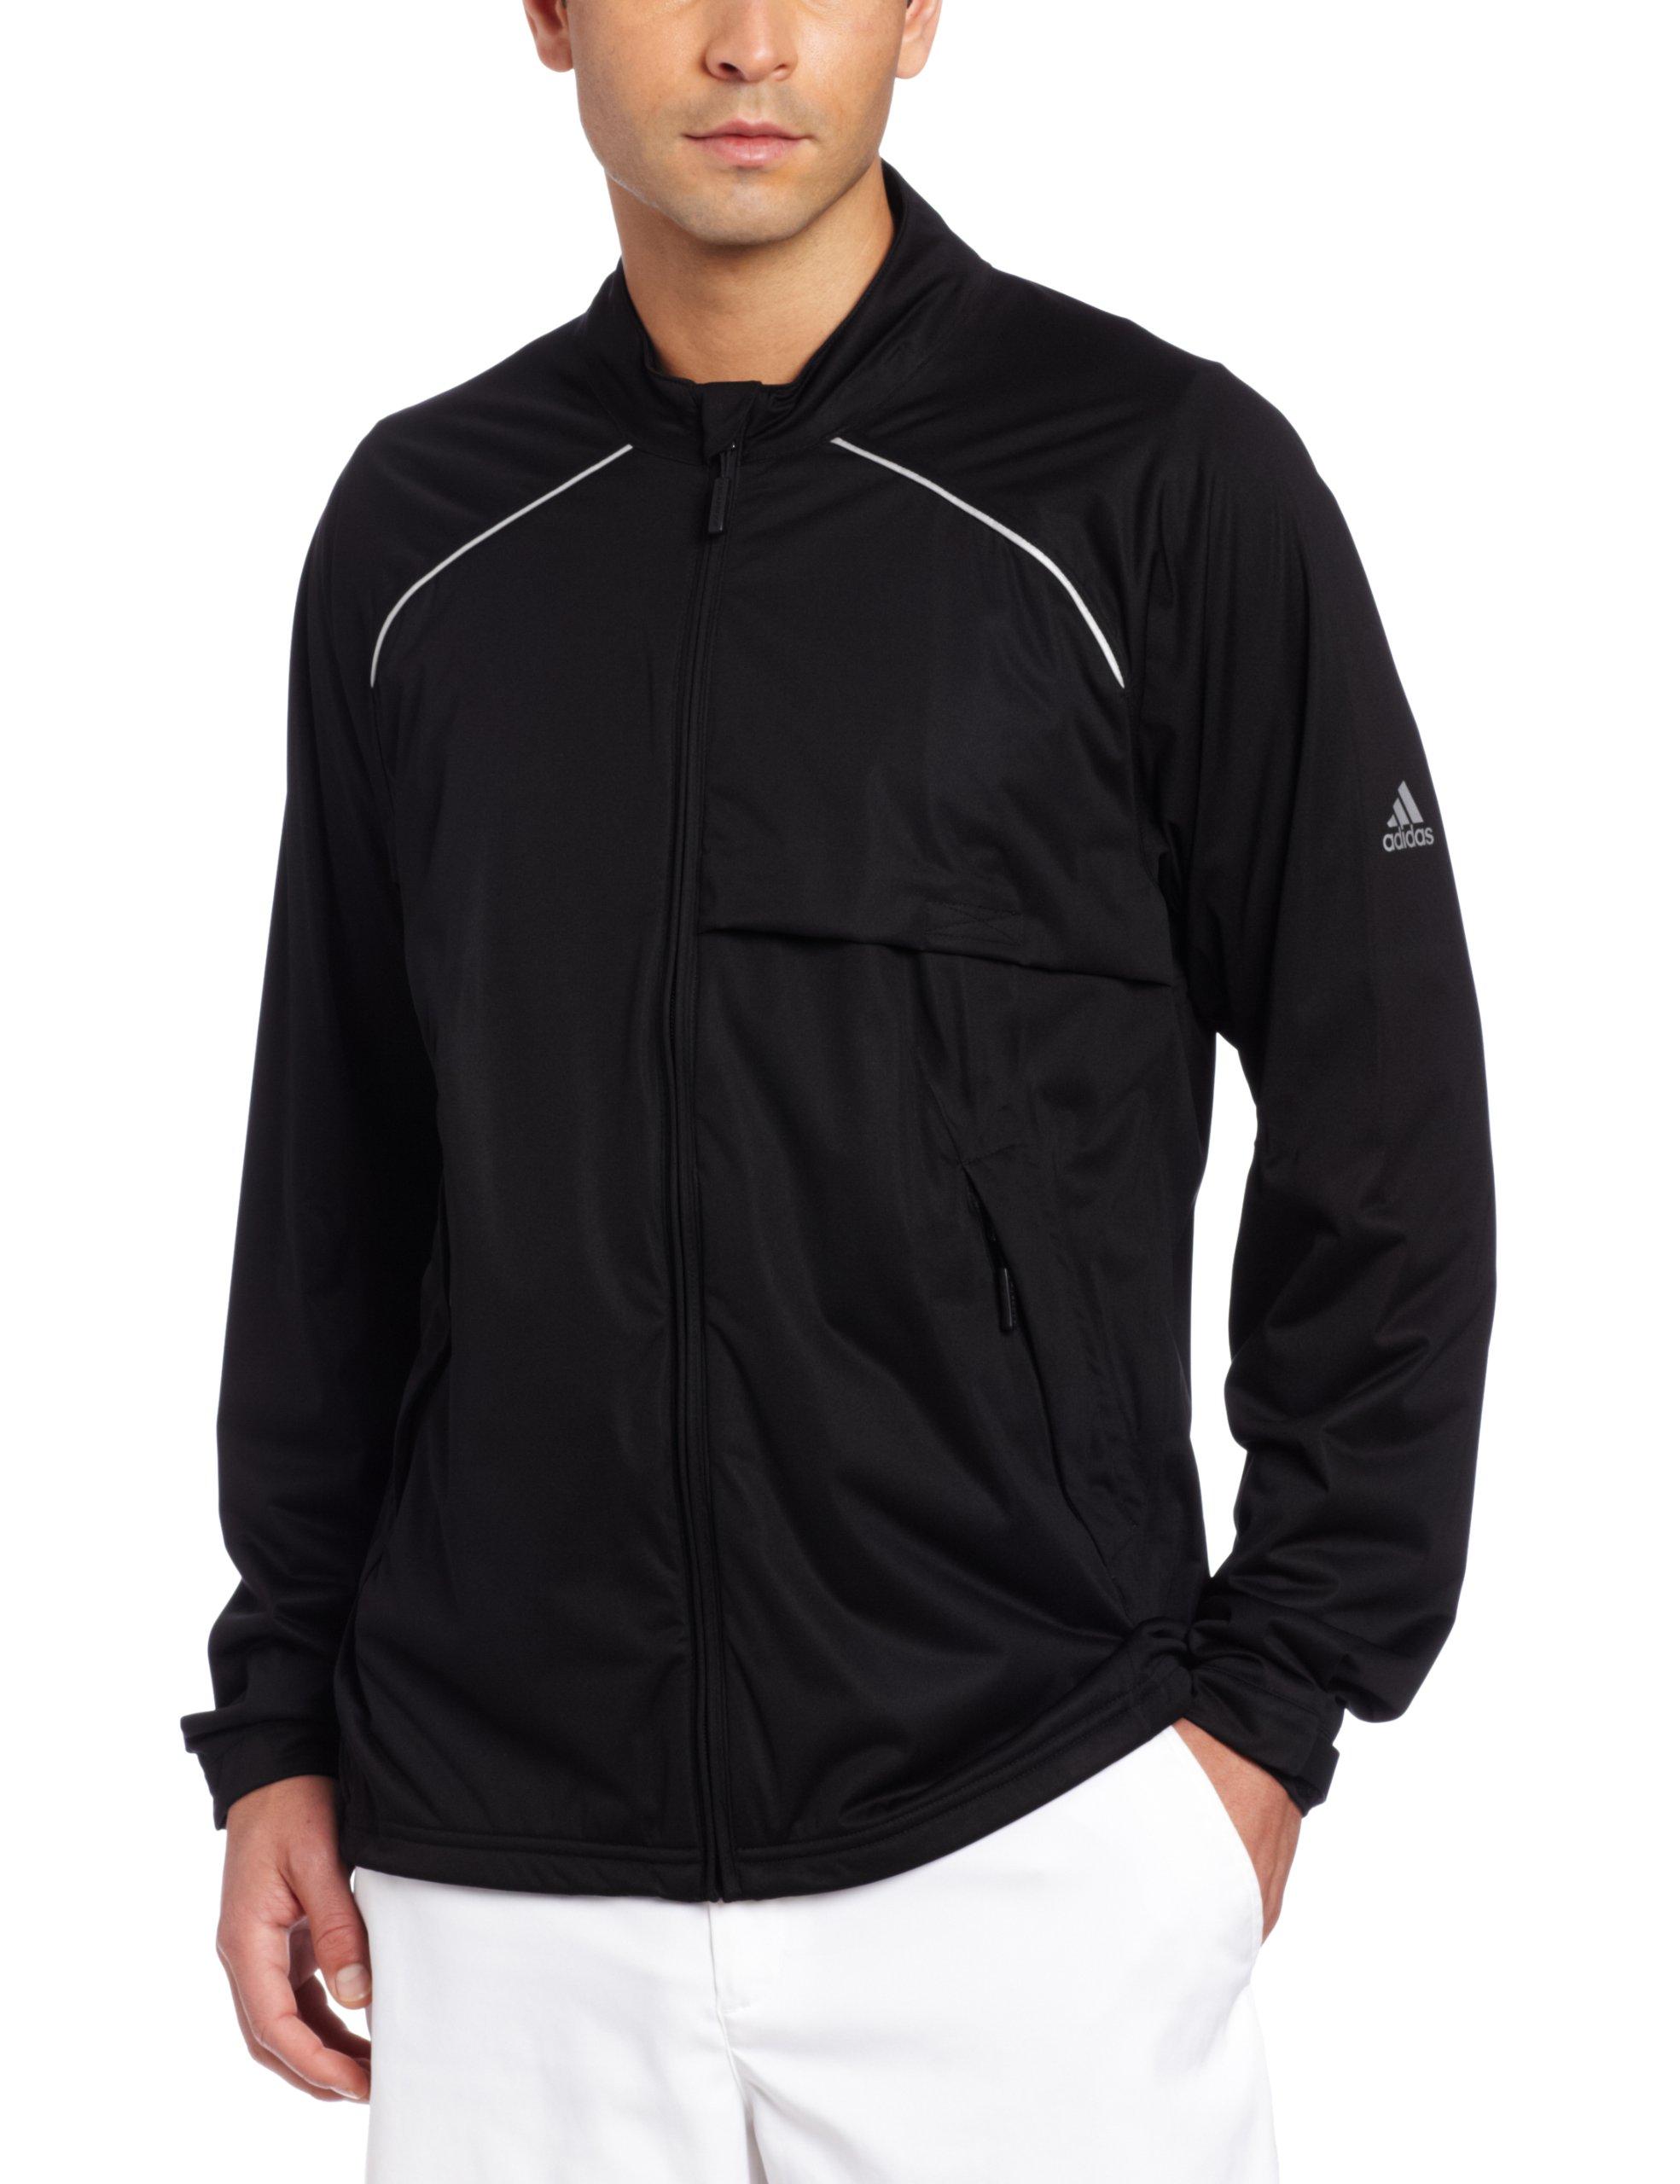 adidas Golf Men's Climaproof Storm Soft Shell Jacket, Black, X-Large by adidas